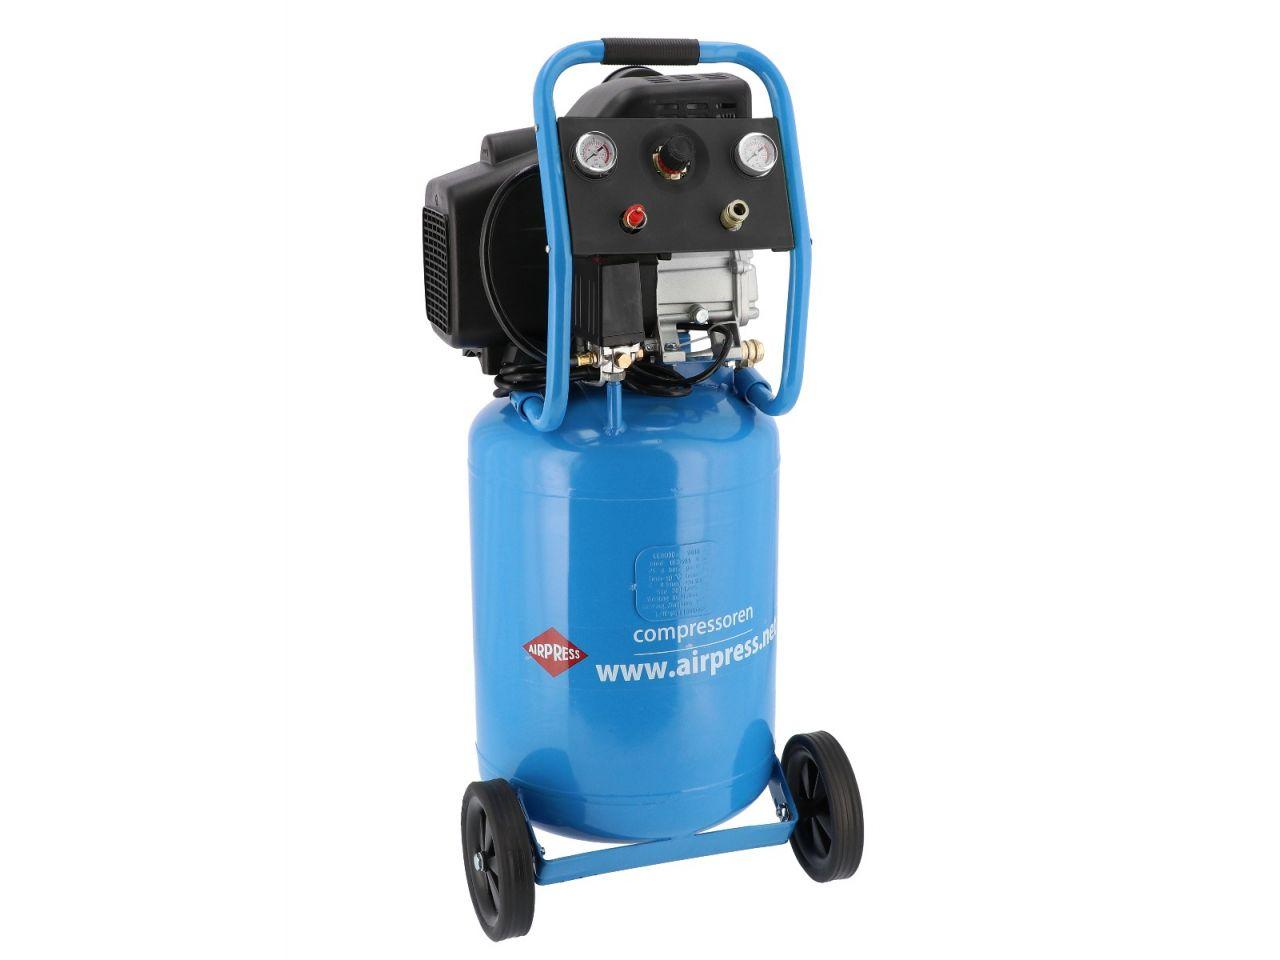 Airpress Compressor HL 360-50  compact